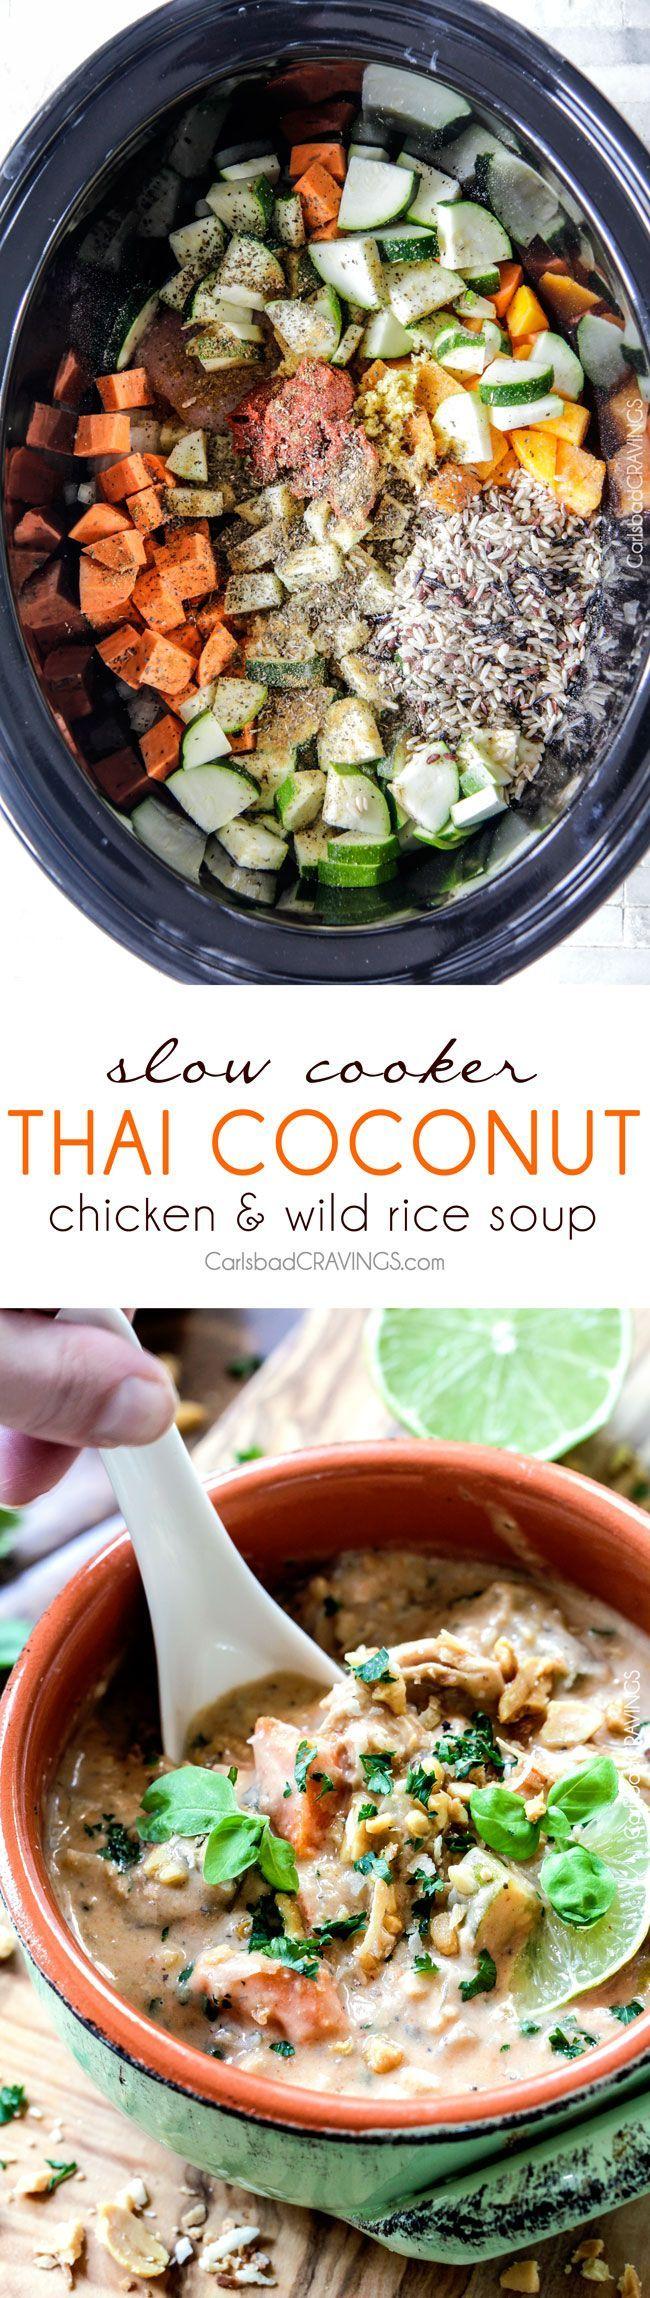 Slow Cooker Thai Coconut Chicken Wild Rice Soup | Recipe ...